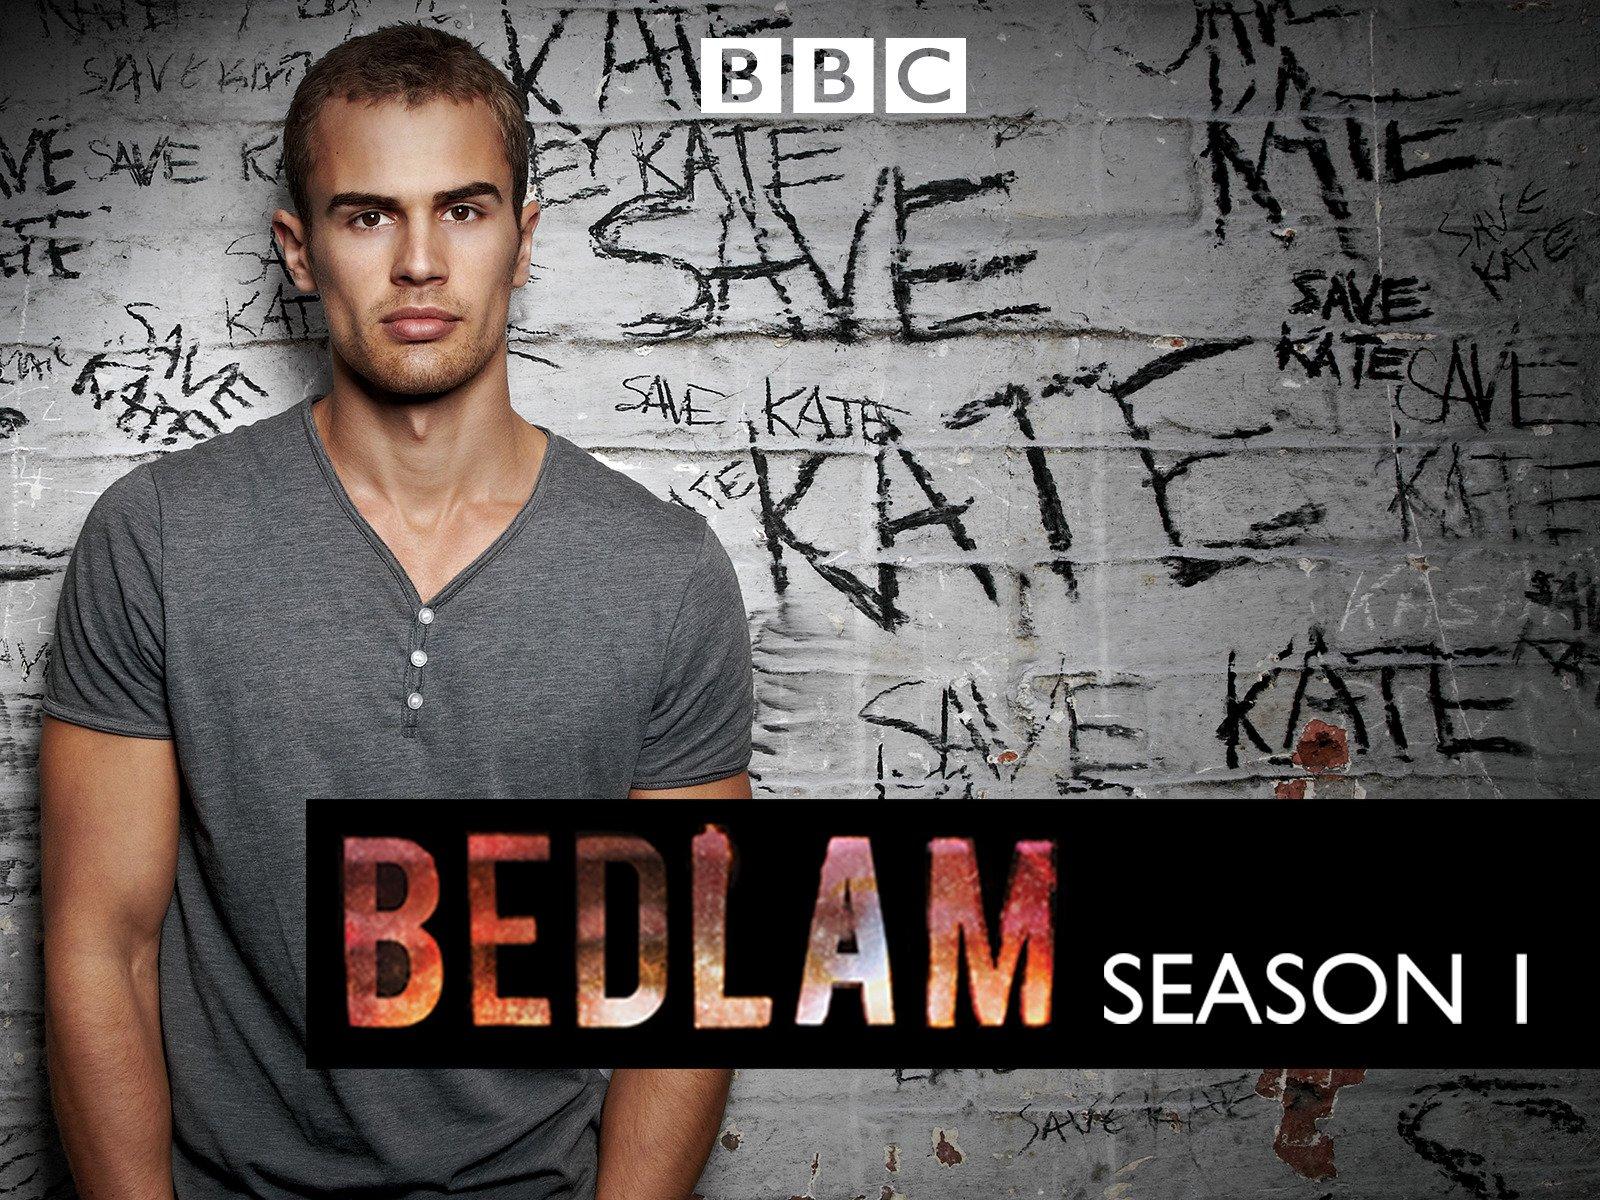 bedlam series 1 episode 1 watch online free